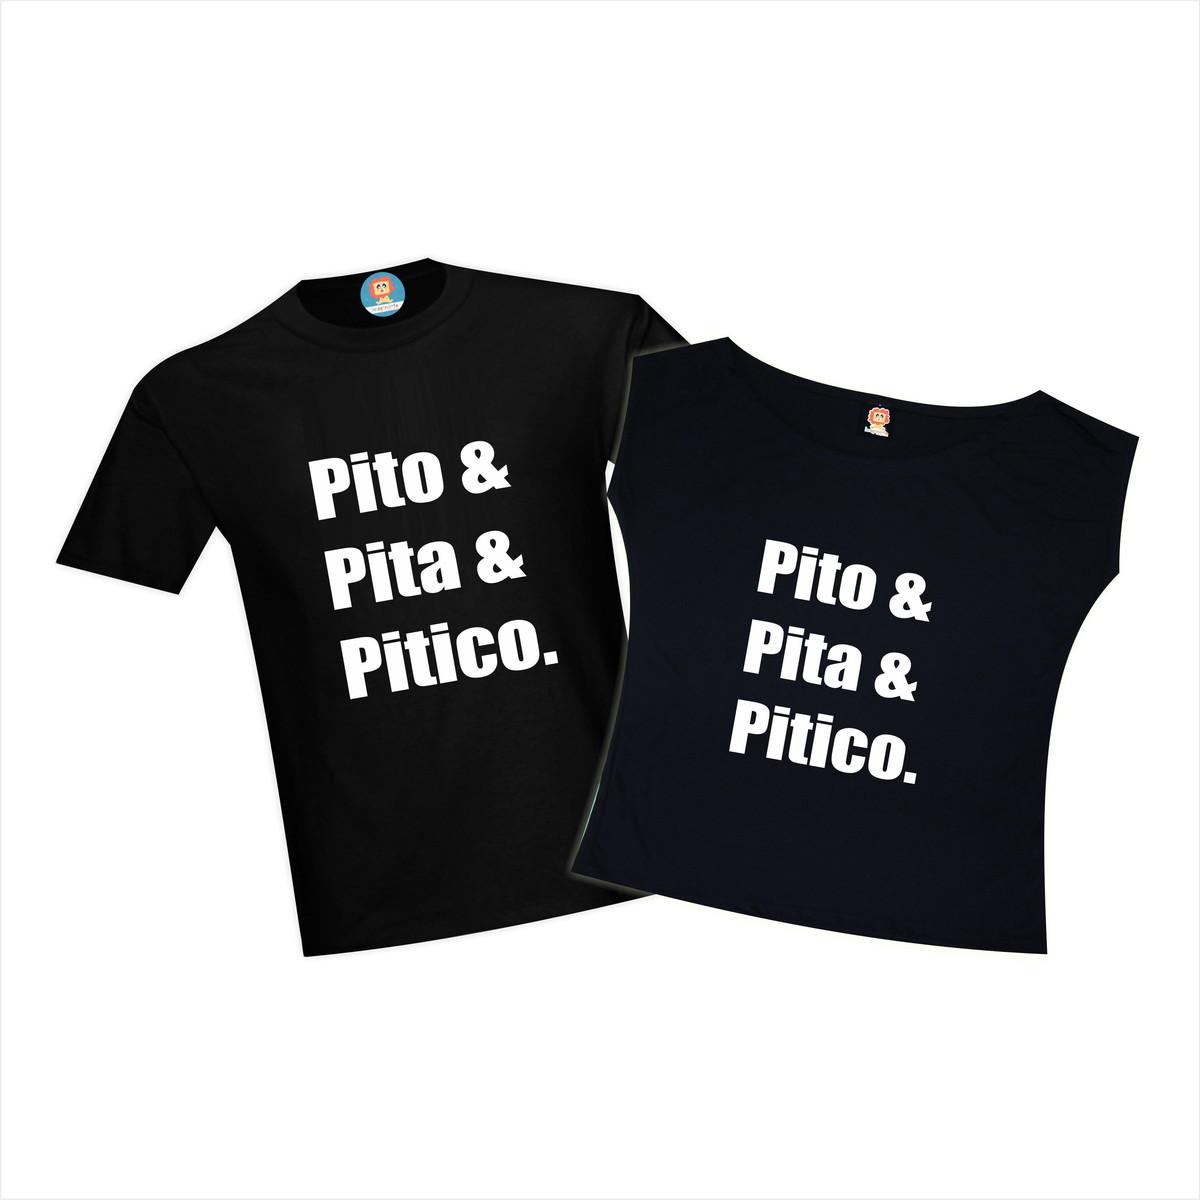 d09d653883 Camisetas Personalizadas Nomes no Elo7